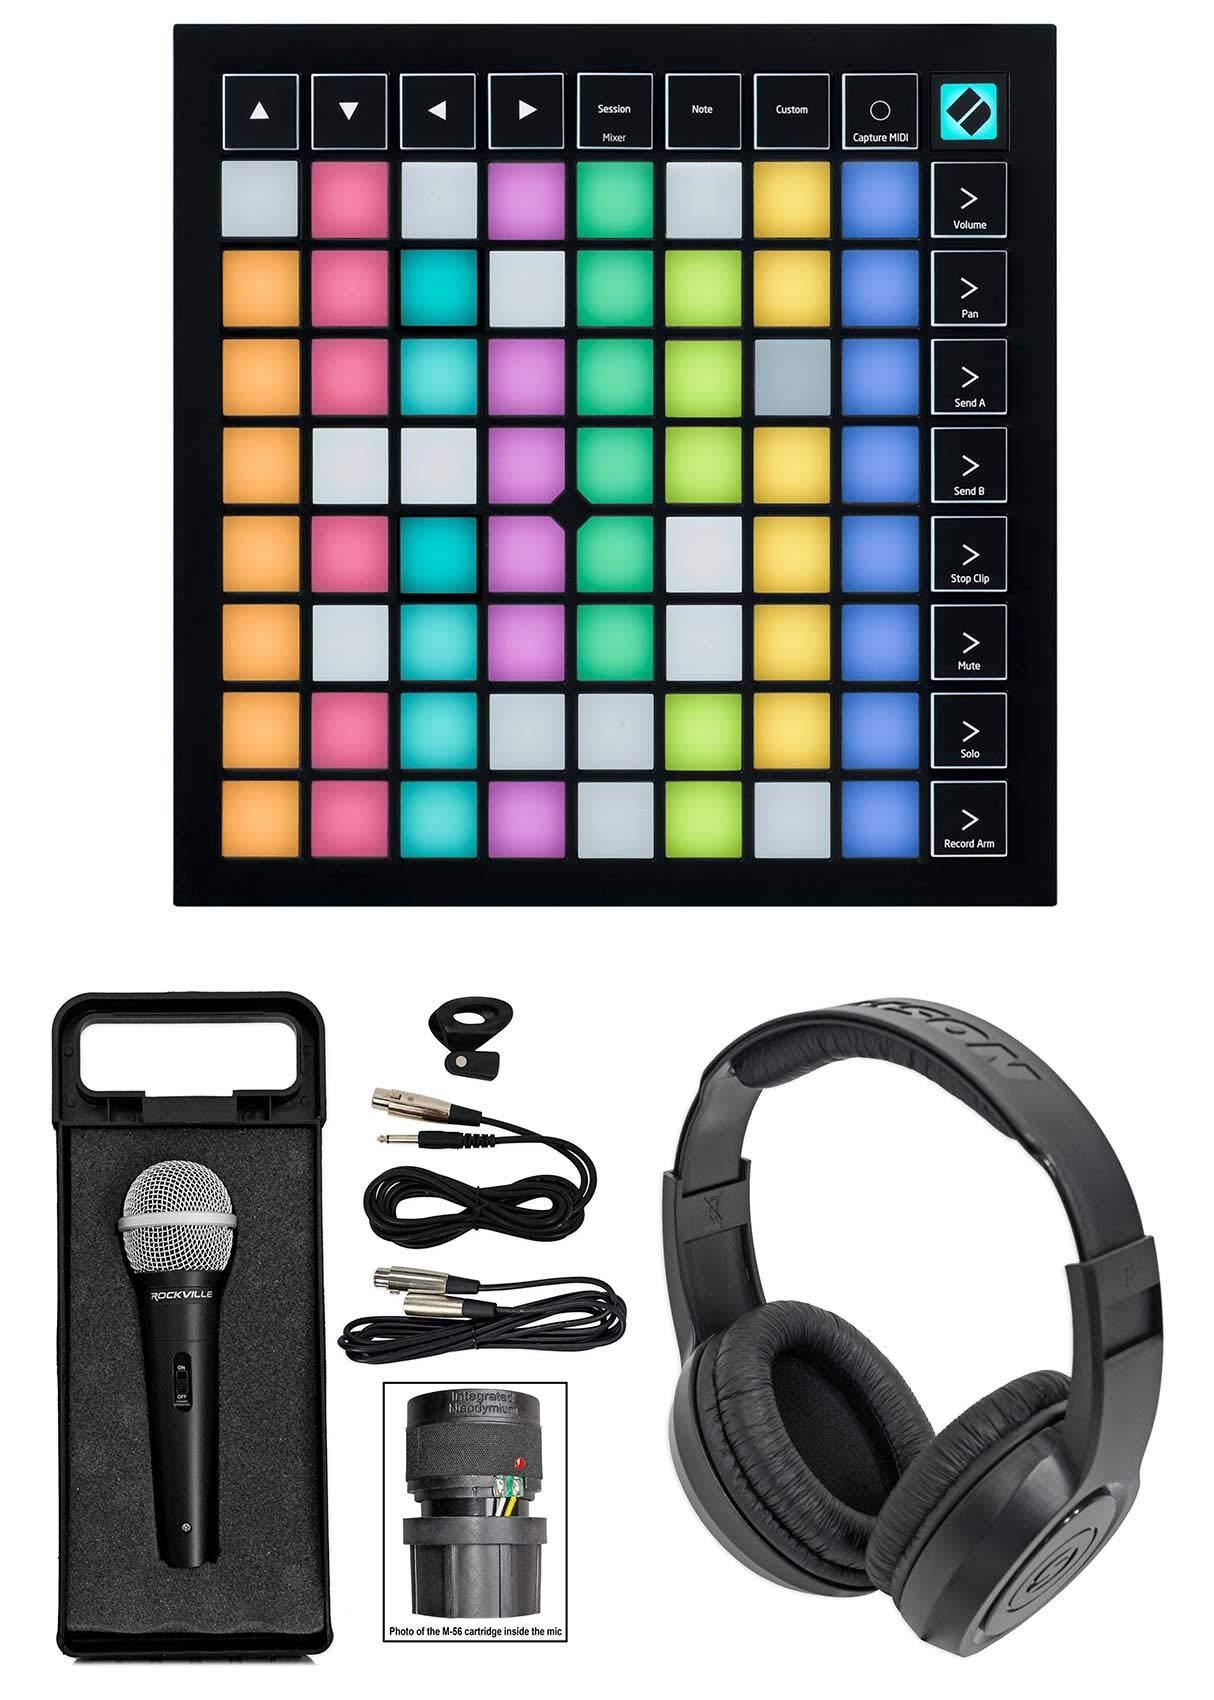 Novation Launchpad X MIDI USB Music Production Pad Controller+Mic+Headphones by Novation